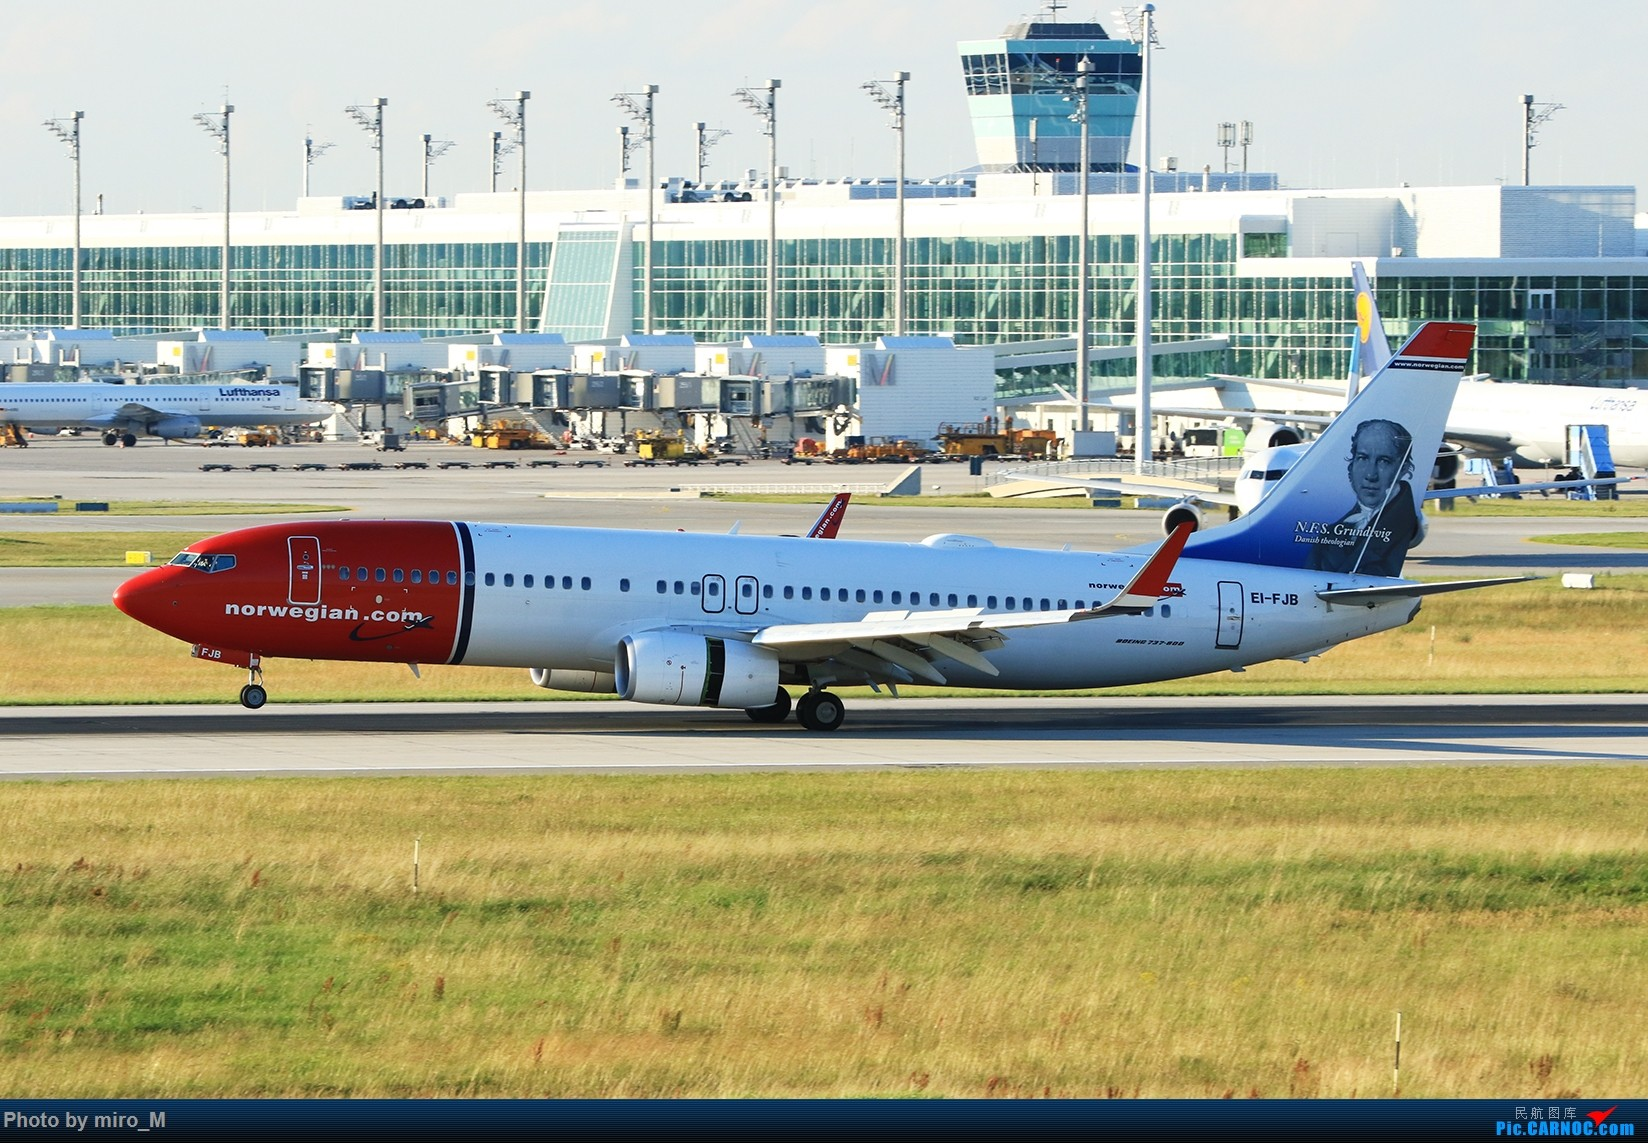 Re:[原创]欧洲浪了一圈,CS100,BAE146,fokker70等新老机型串着飞+ZRH,MUC,FRA,AMS,TLS拍机 BOEING 737-800 EI-FJB MUC